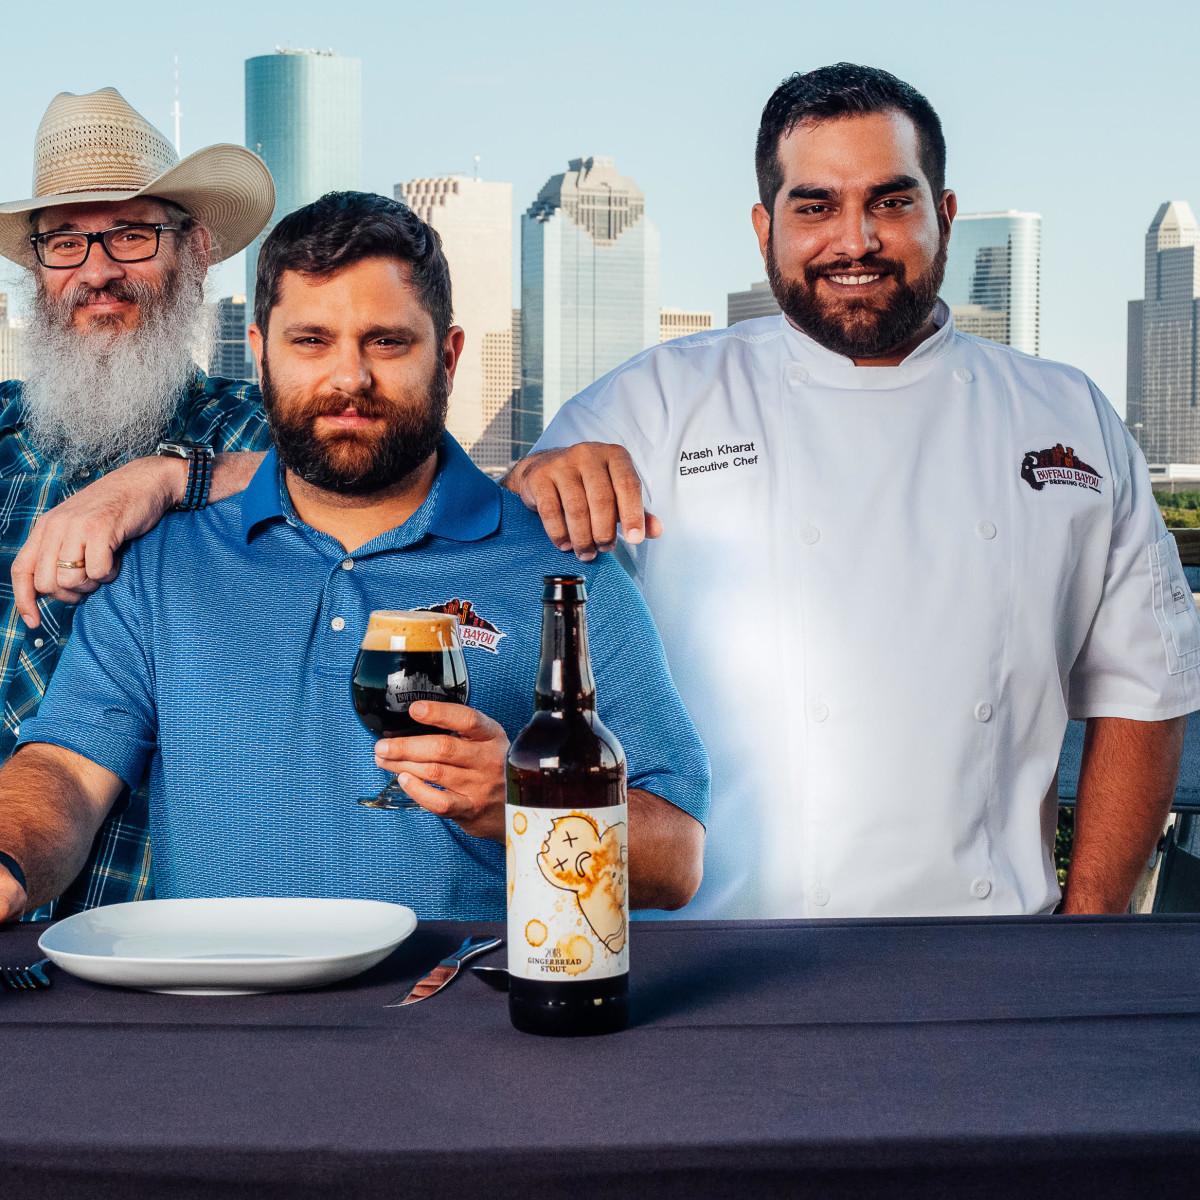 Buffalo Bayou Brewing Company Troy Witherspoon Rassul Zarinfar Arash Kharat